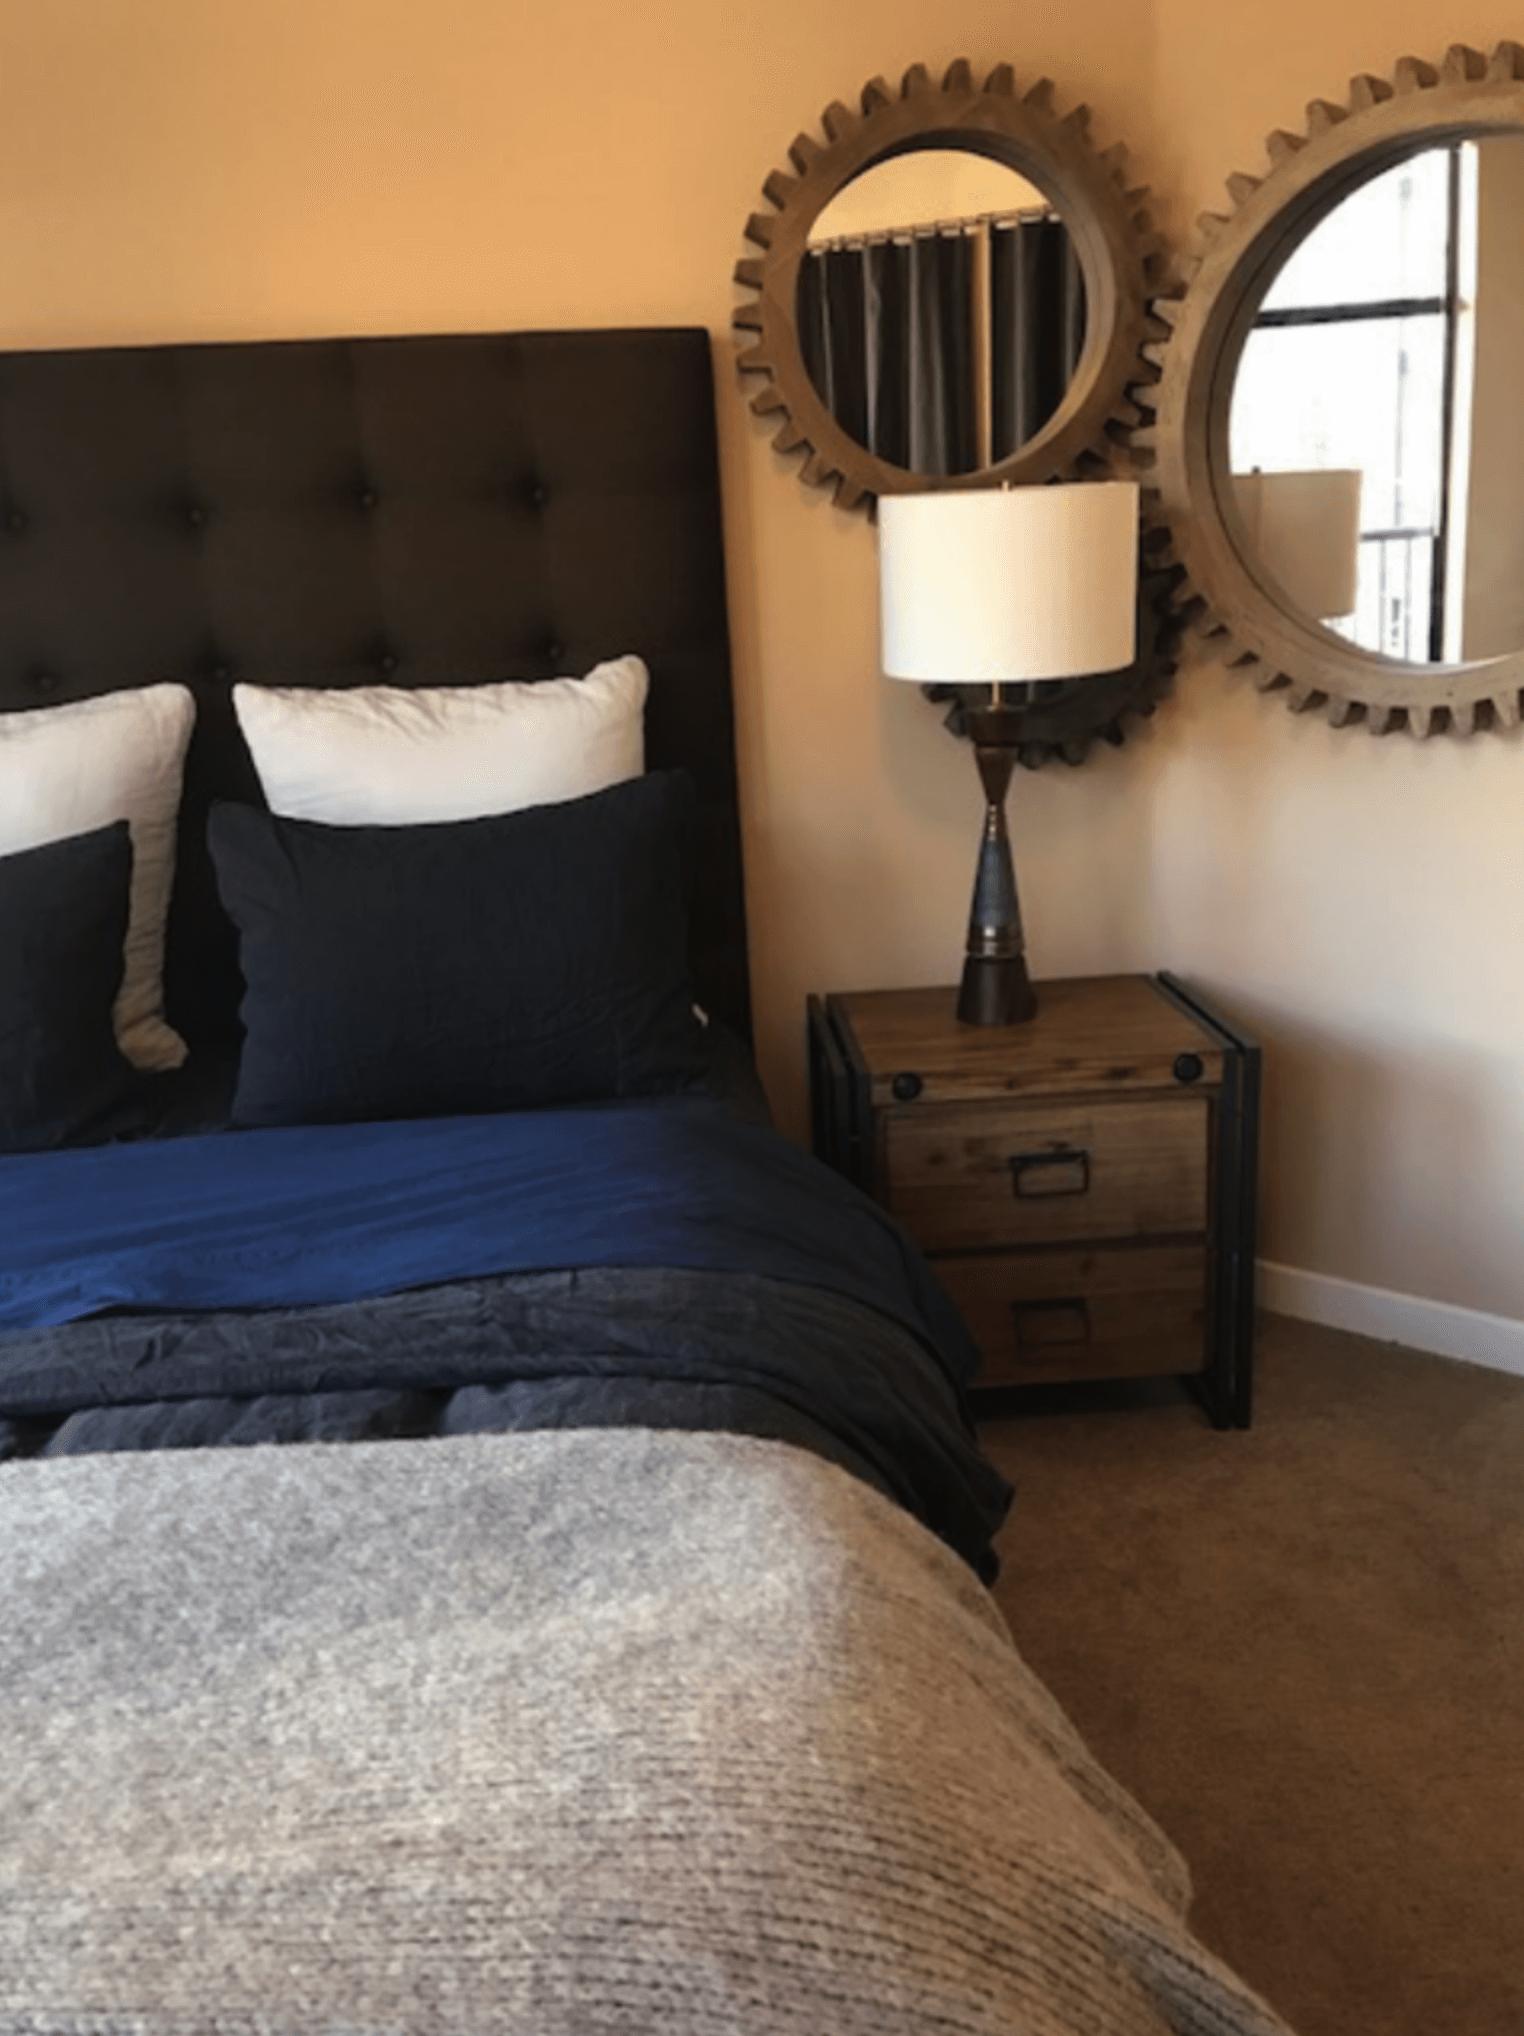 Bachelor pad industrial bedroom